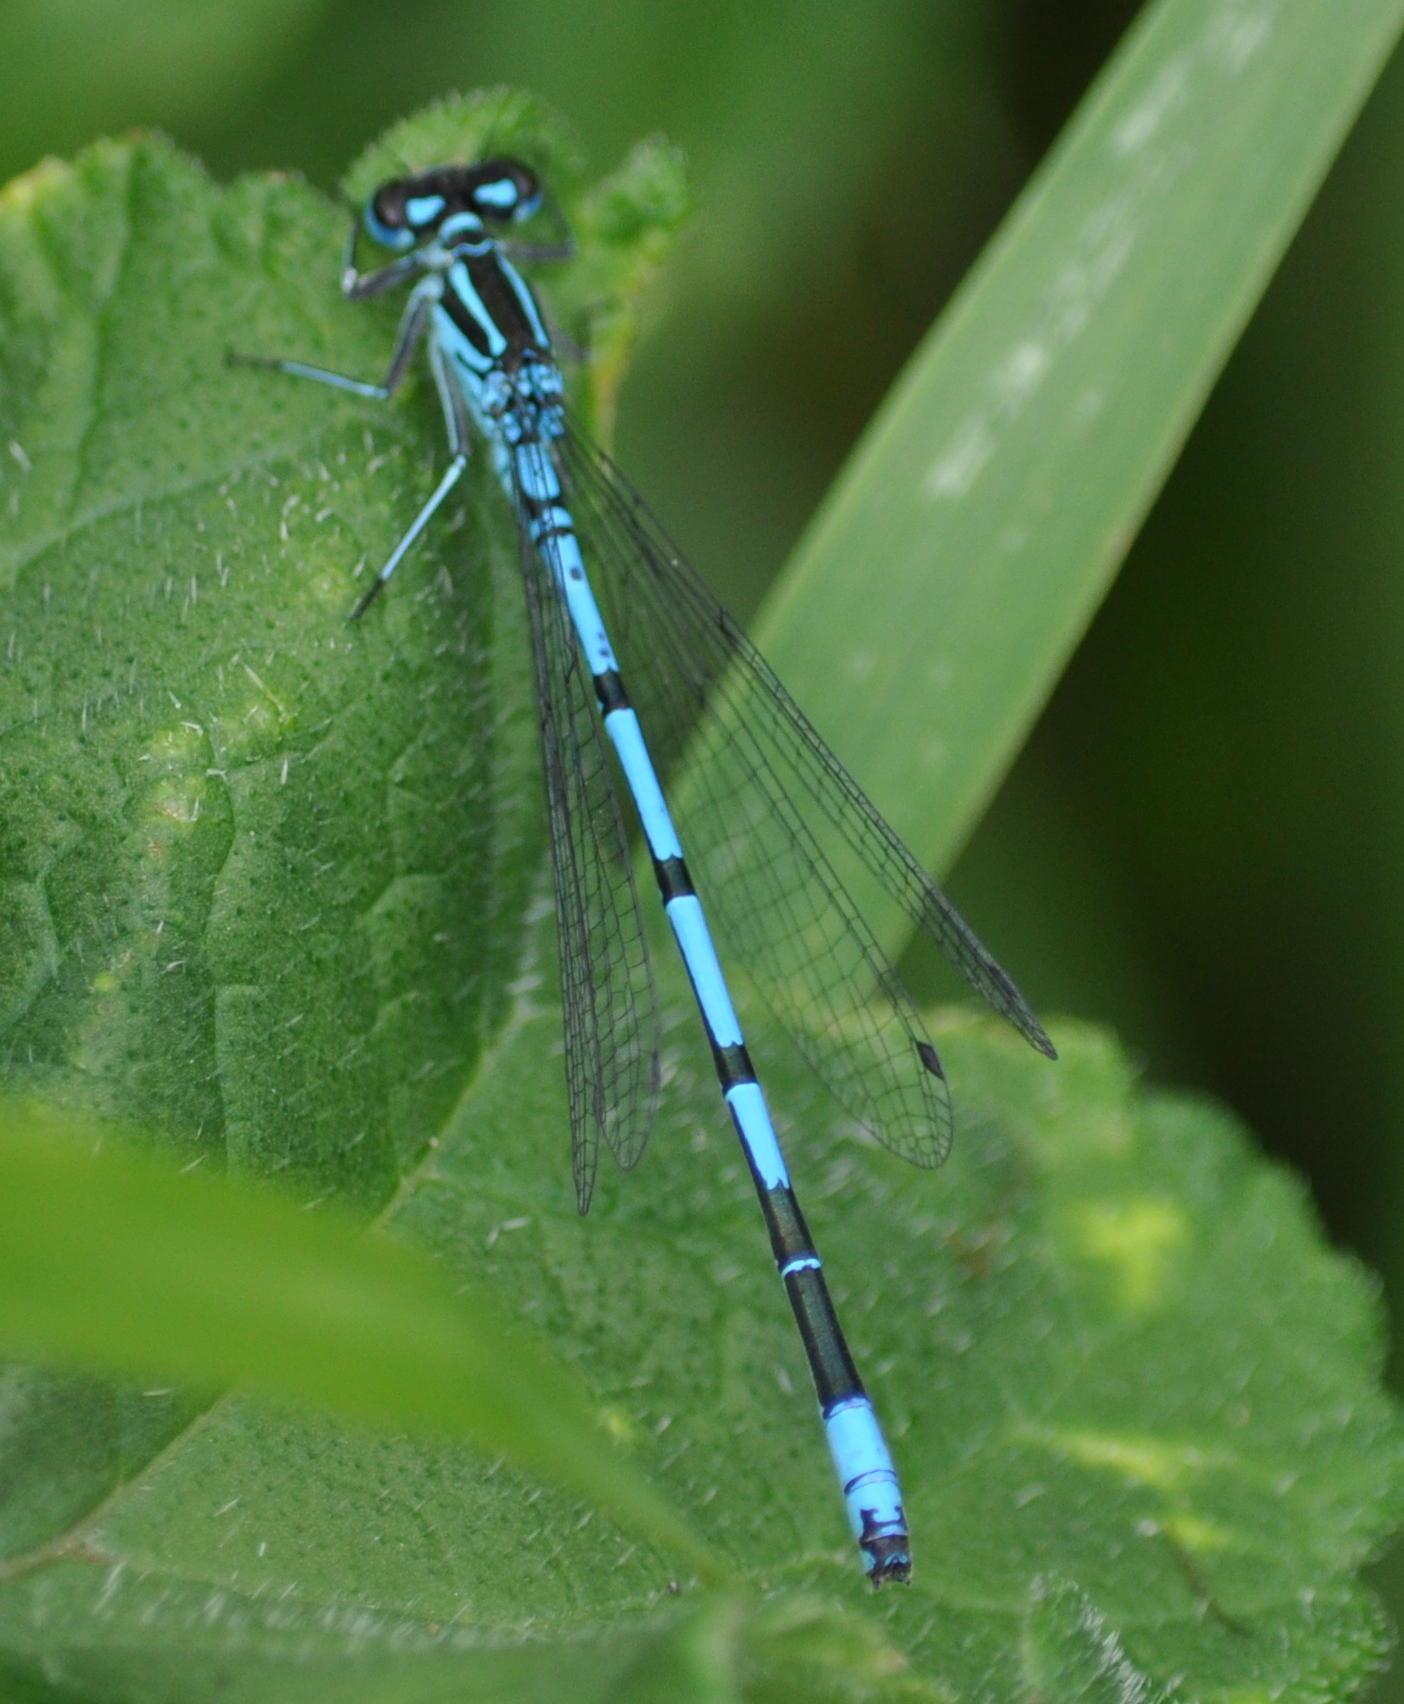 azure damsel flies fly - photo #40